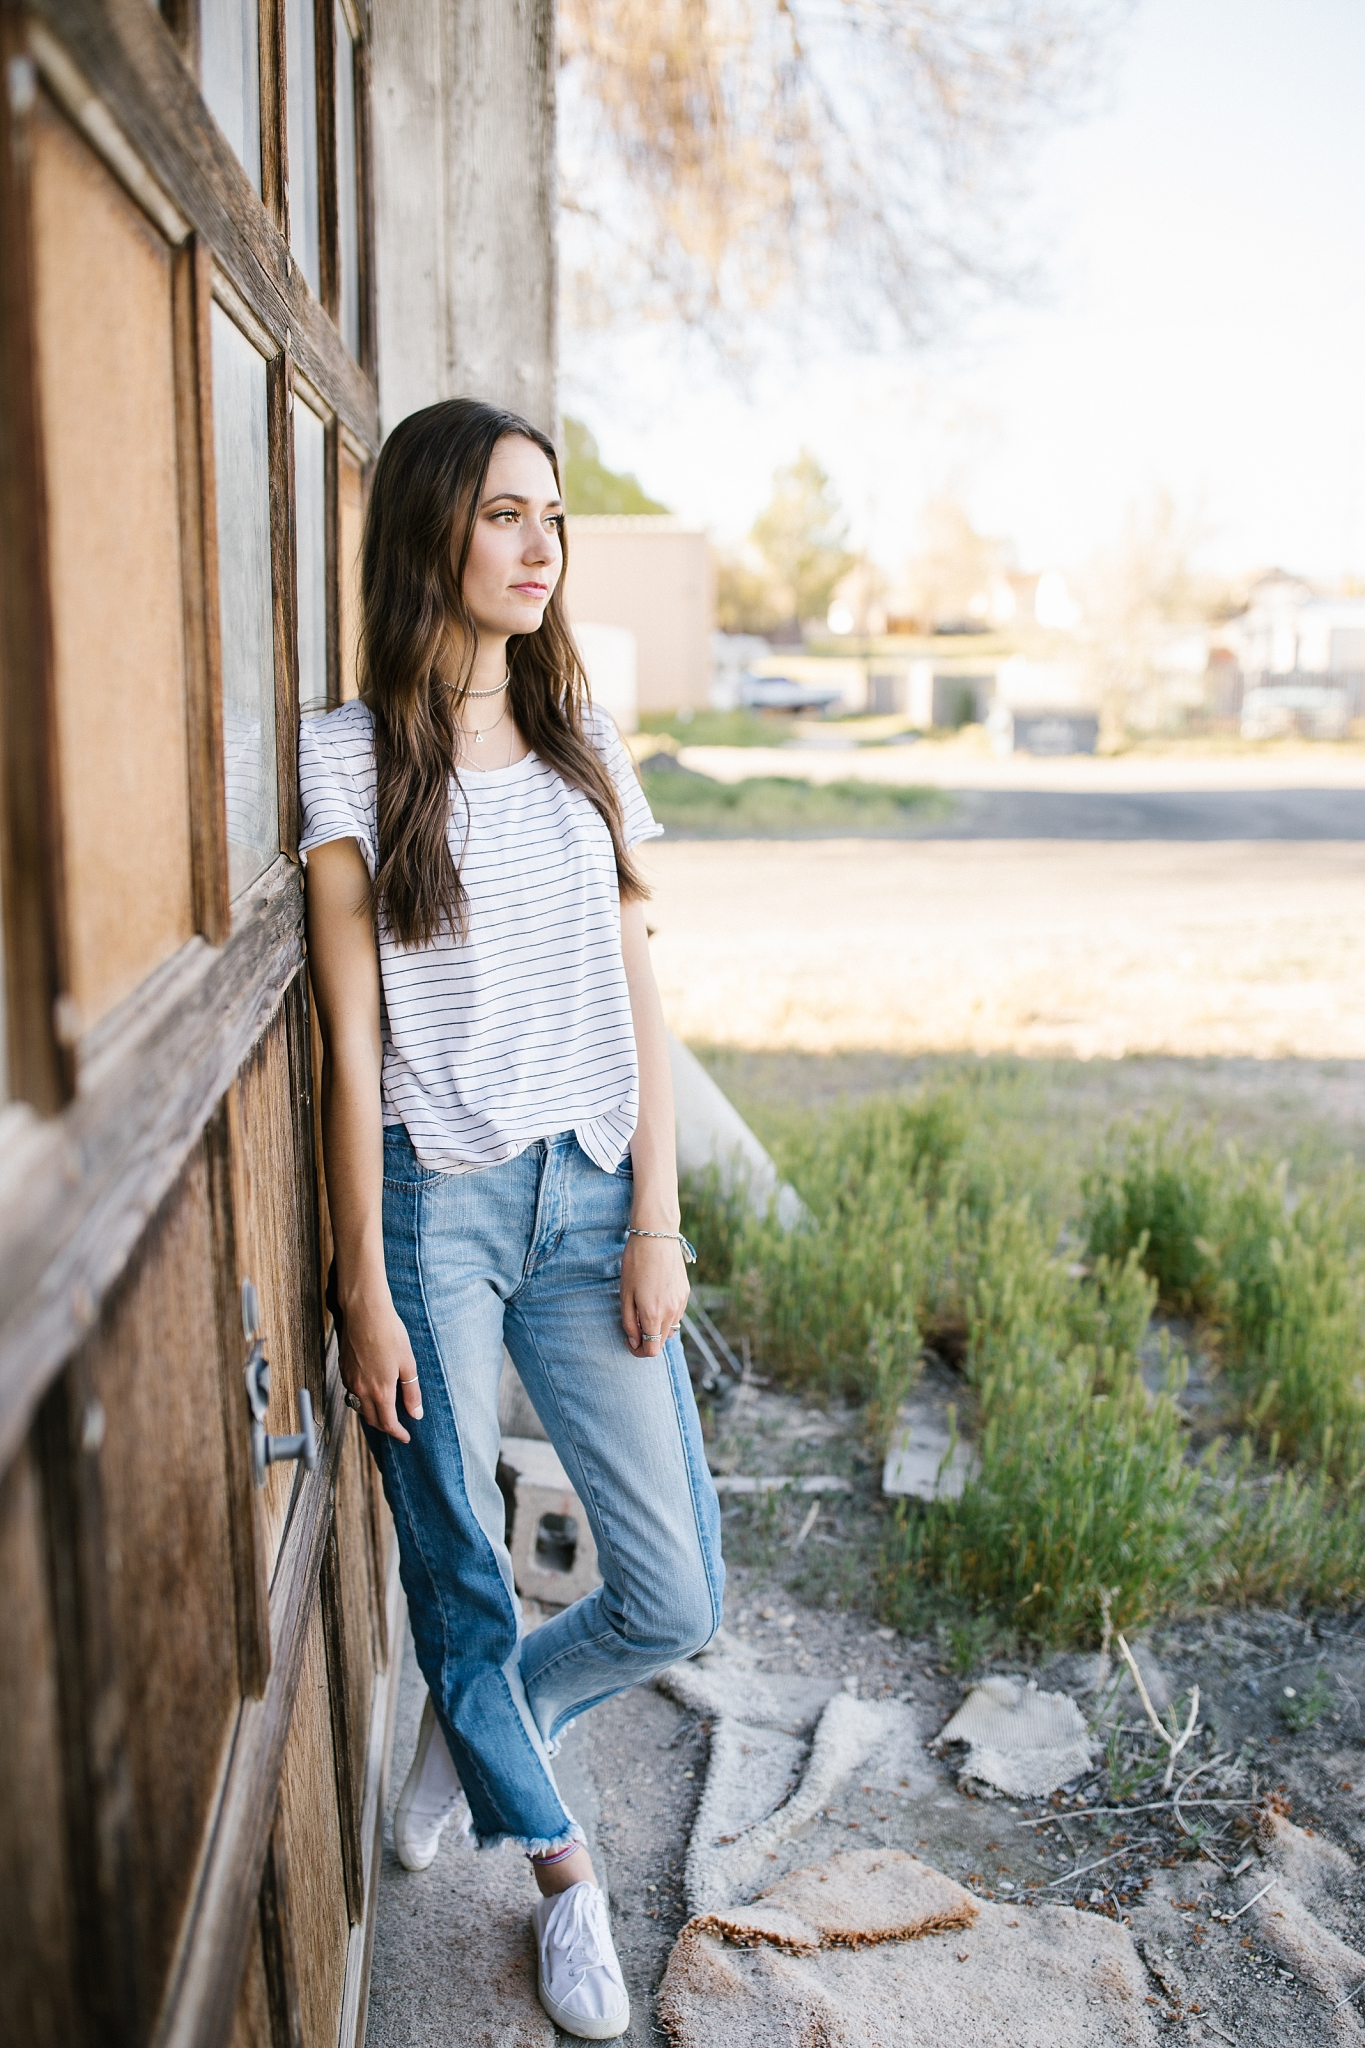 Audrey-80_Lizzie-B-Imagery-Utah-Family-Photographer-Central-Utah-Senior-Photography.jpg